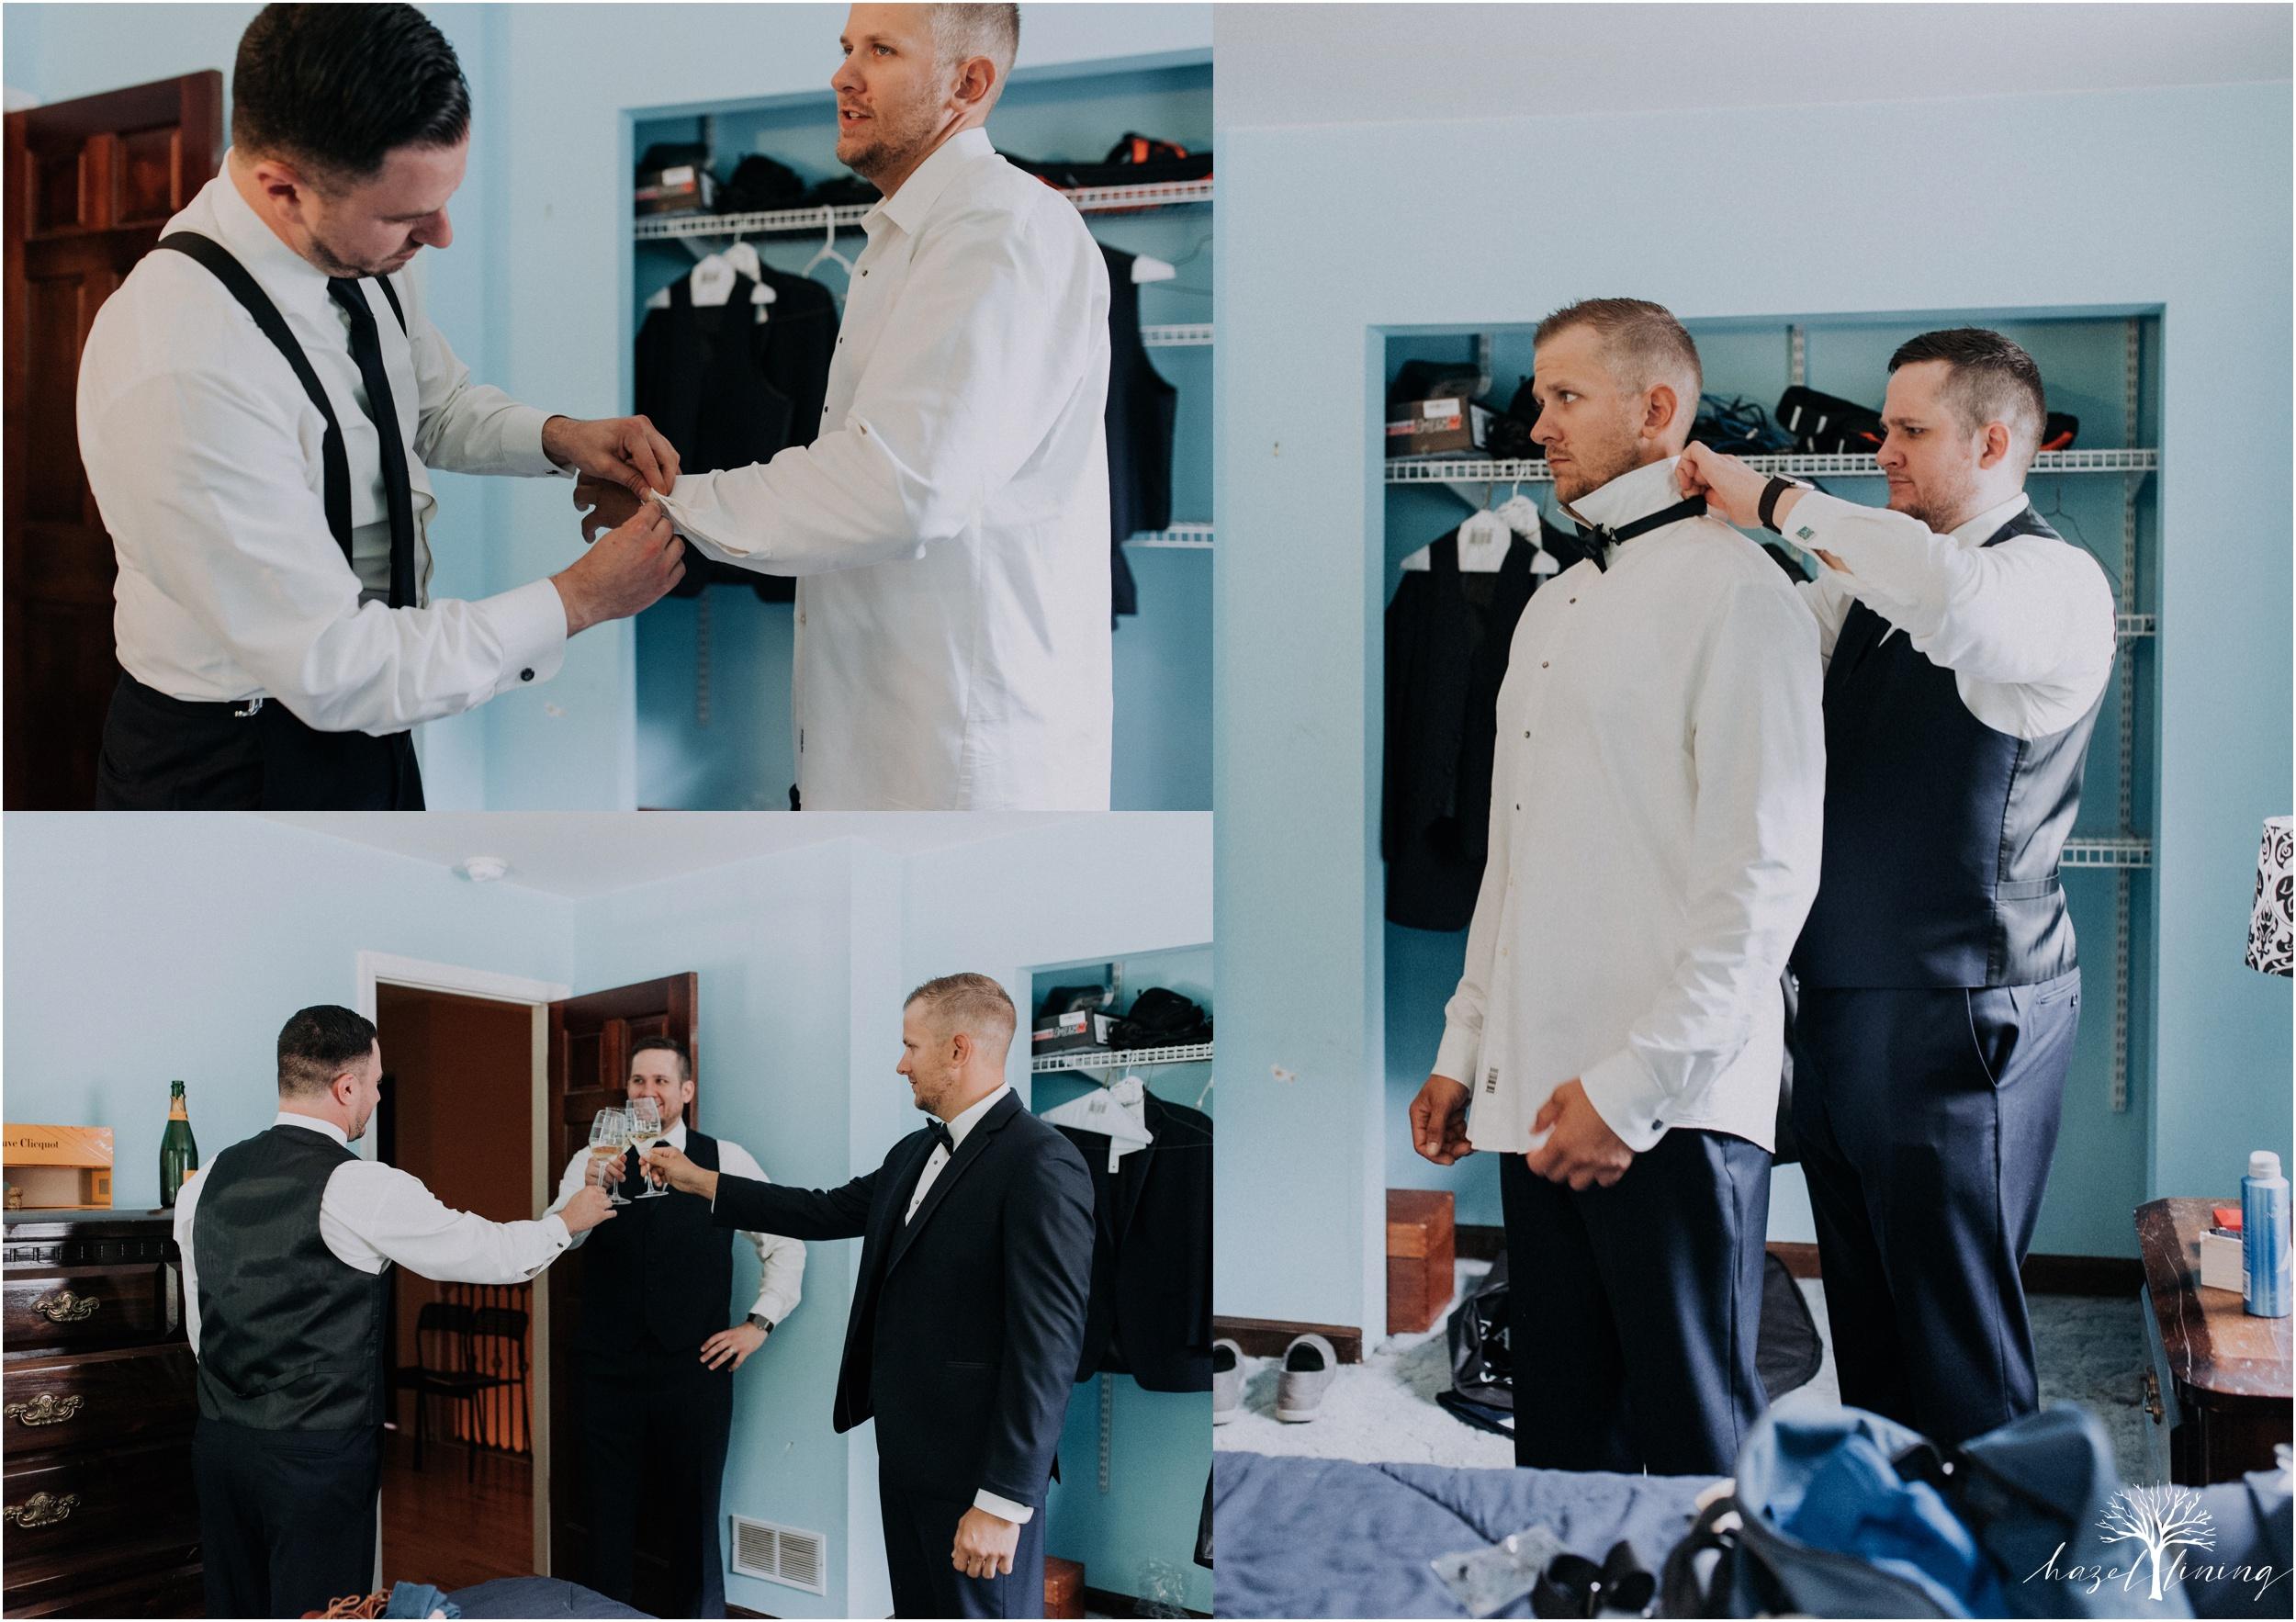 alyssa-james-stiteler-wedding-loft-and-sweet-water-cc-pennsburg-pennsylvania-hazel-lining-travel-wedding-elopement-photography_0003.jpg